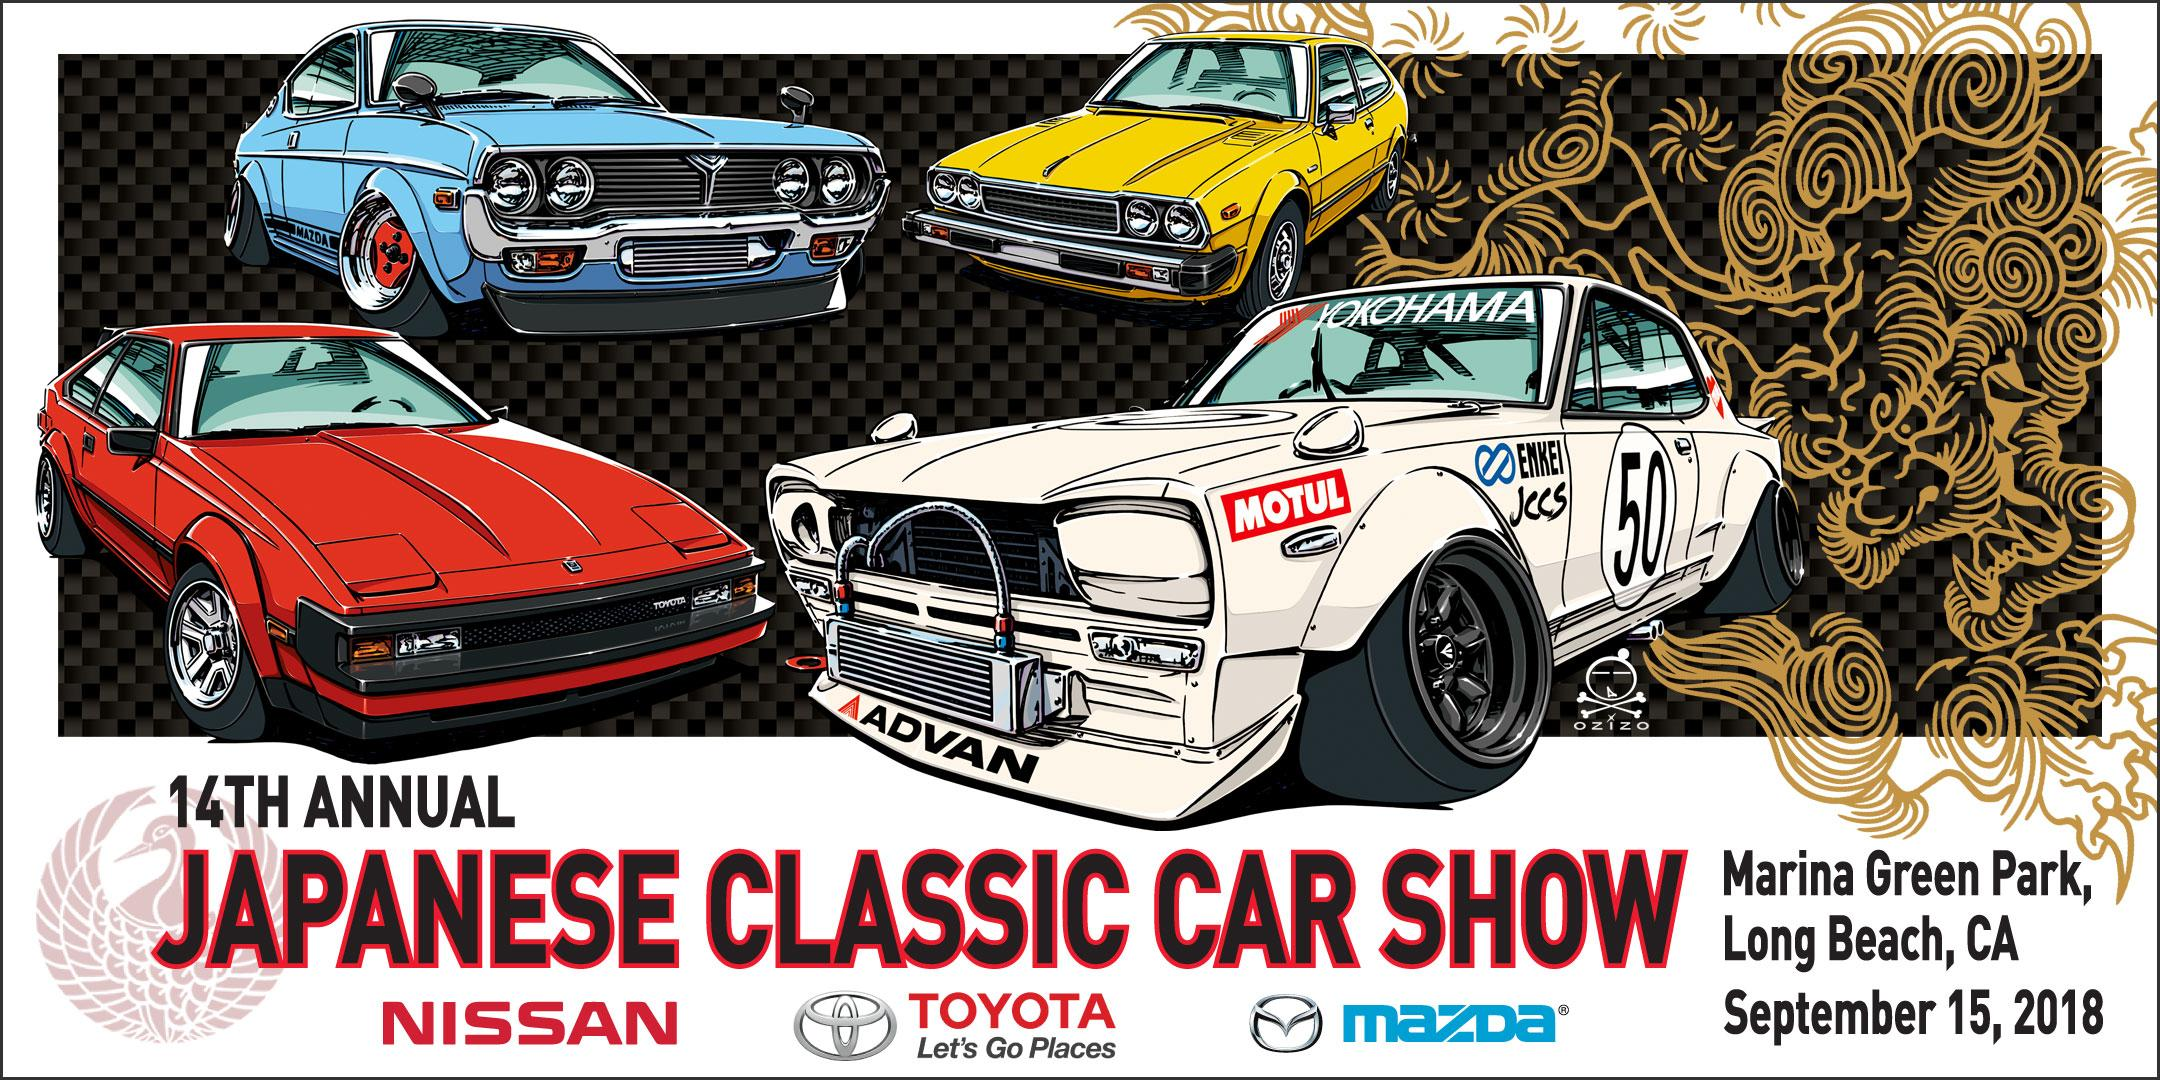 Car_Show_ATM_Rental_Company_Mobile_Outdoor_ATM_Rental_Special_Events_Long_Beach_California.jpg